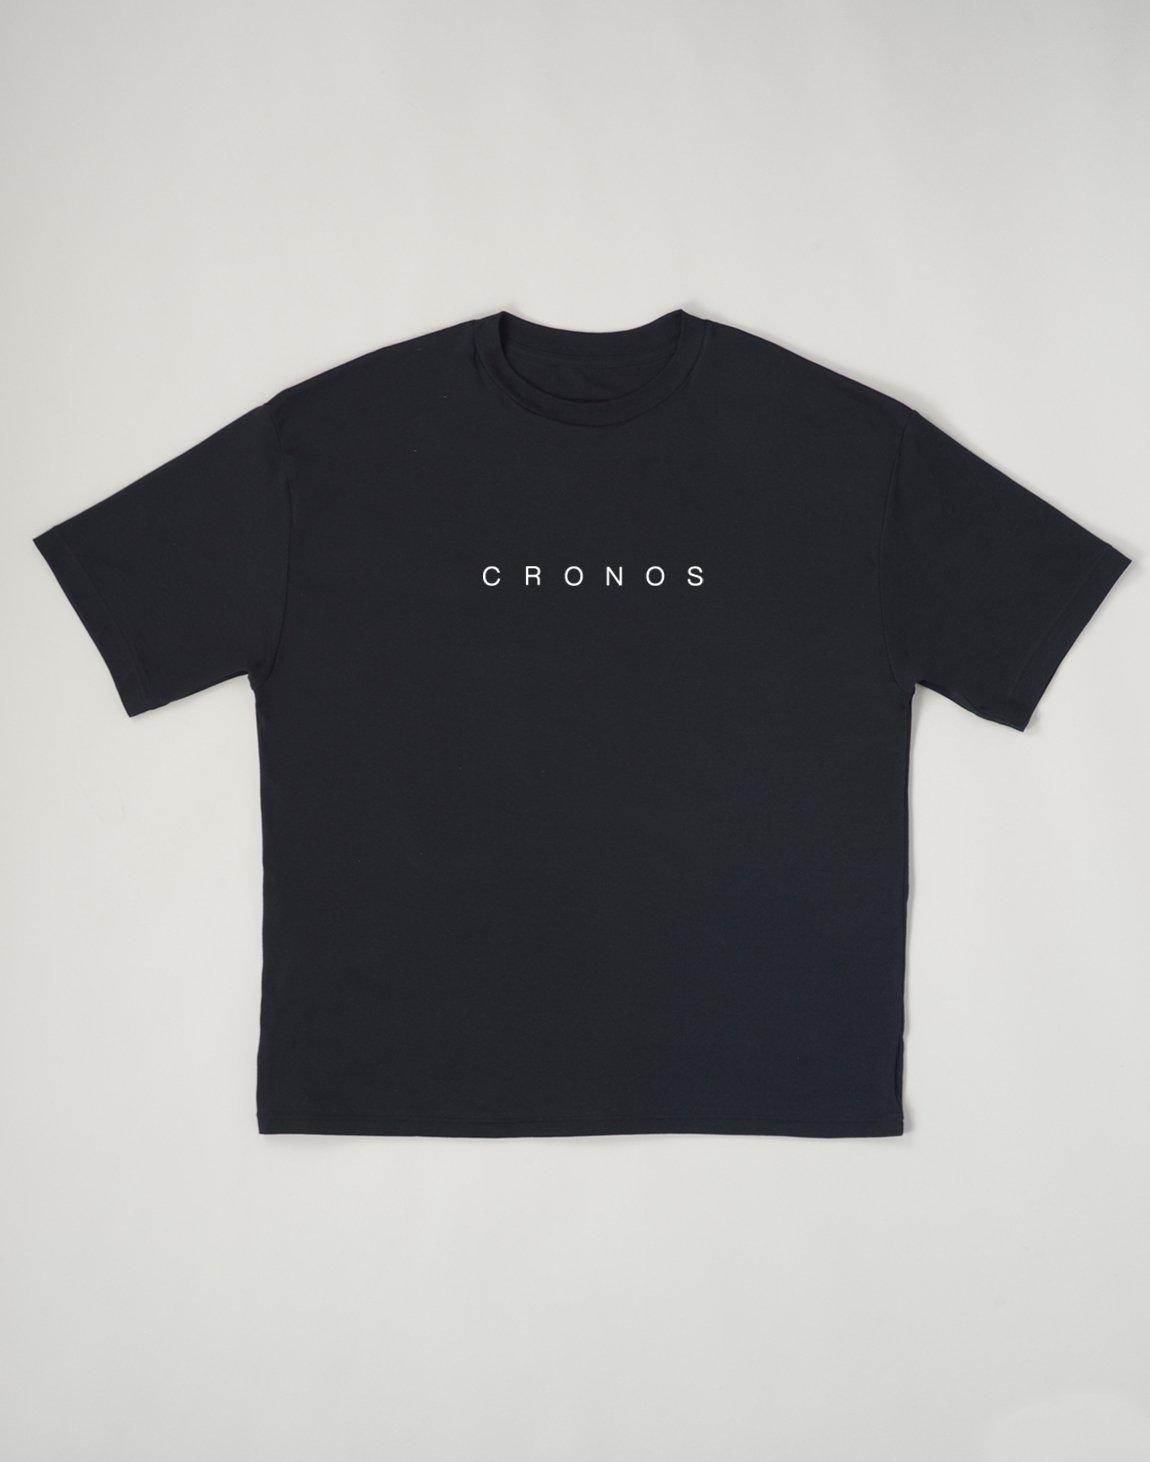 CRONOS NEW FONT LOGO OVER SIZE T-SHIRTS【BLACK】